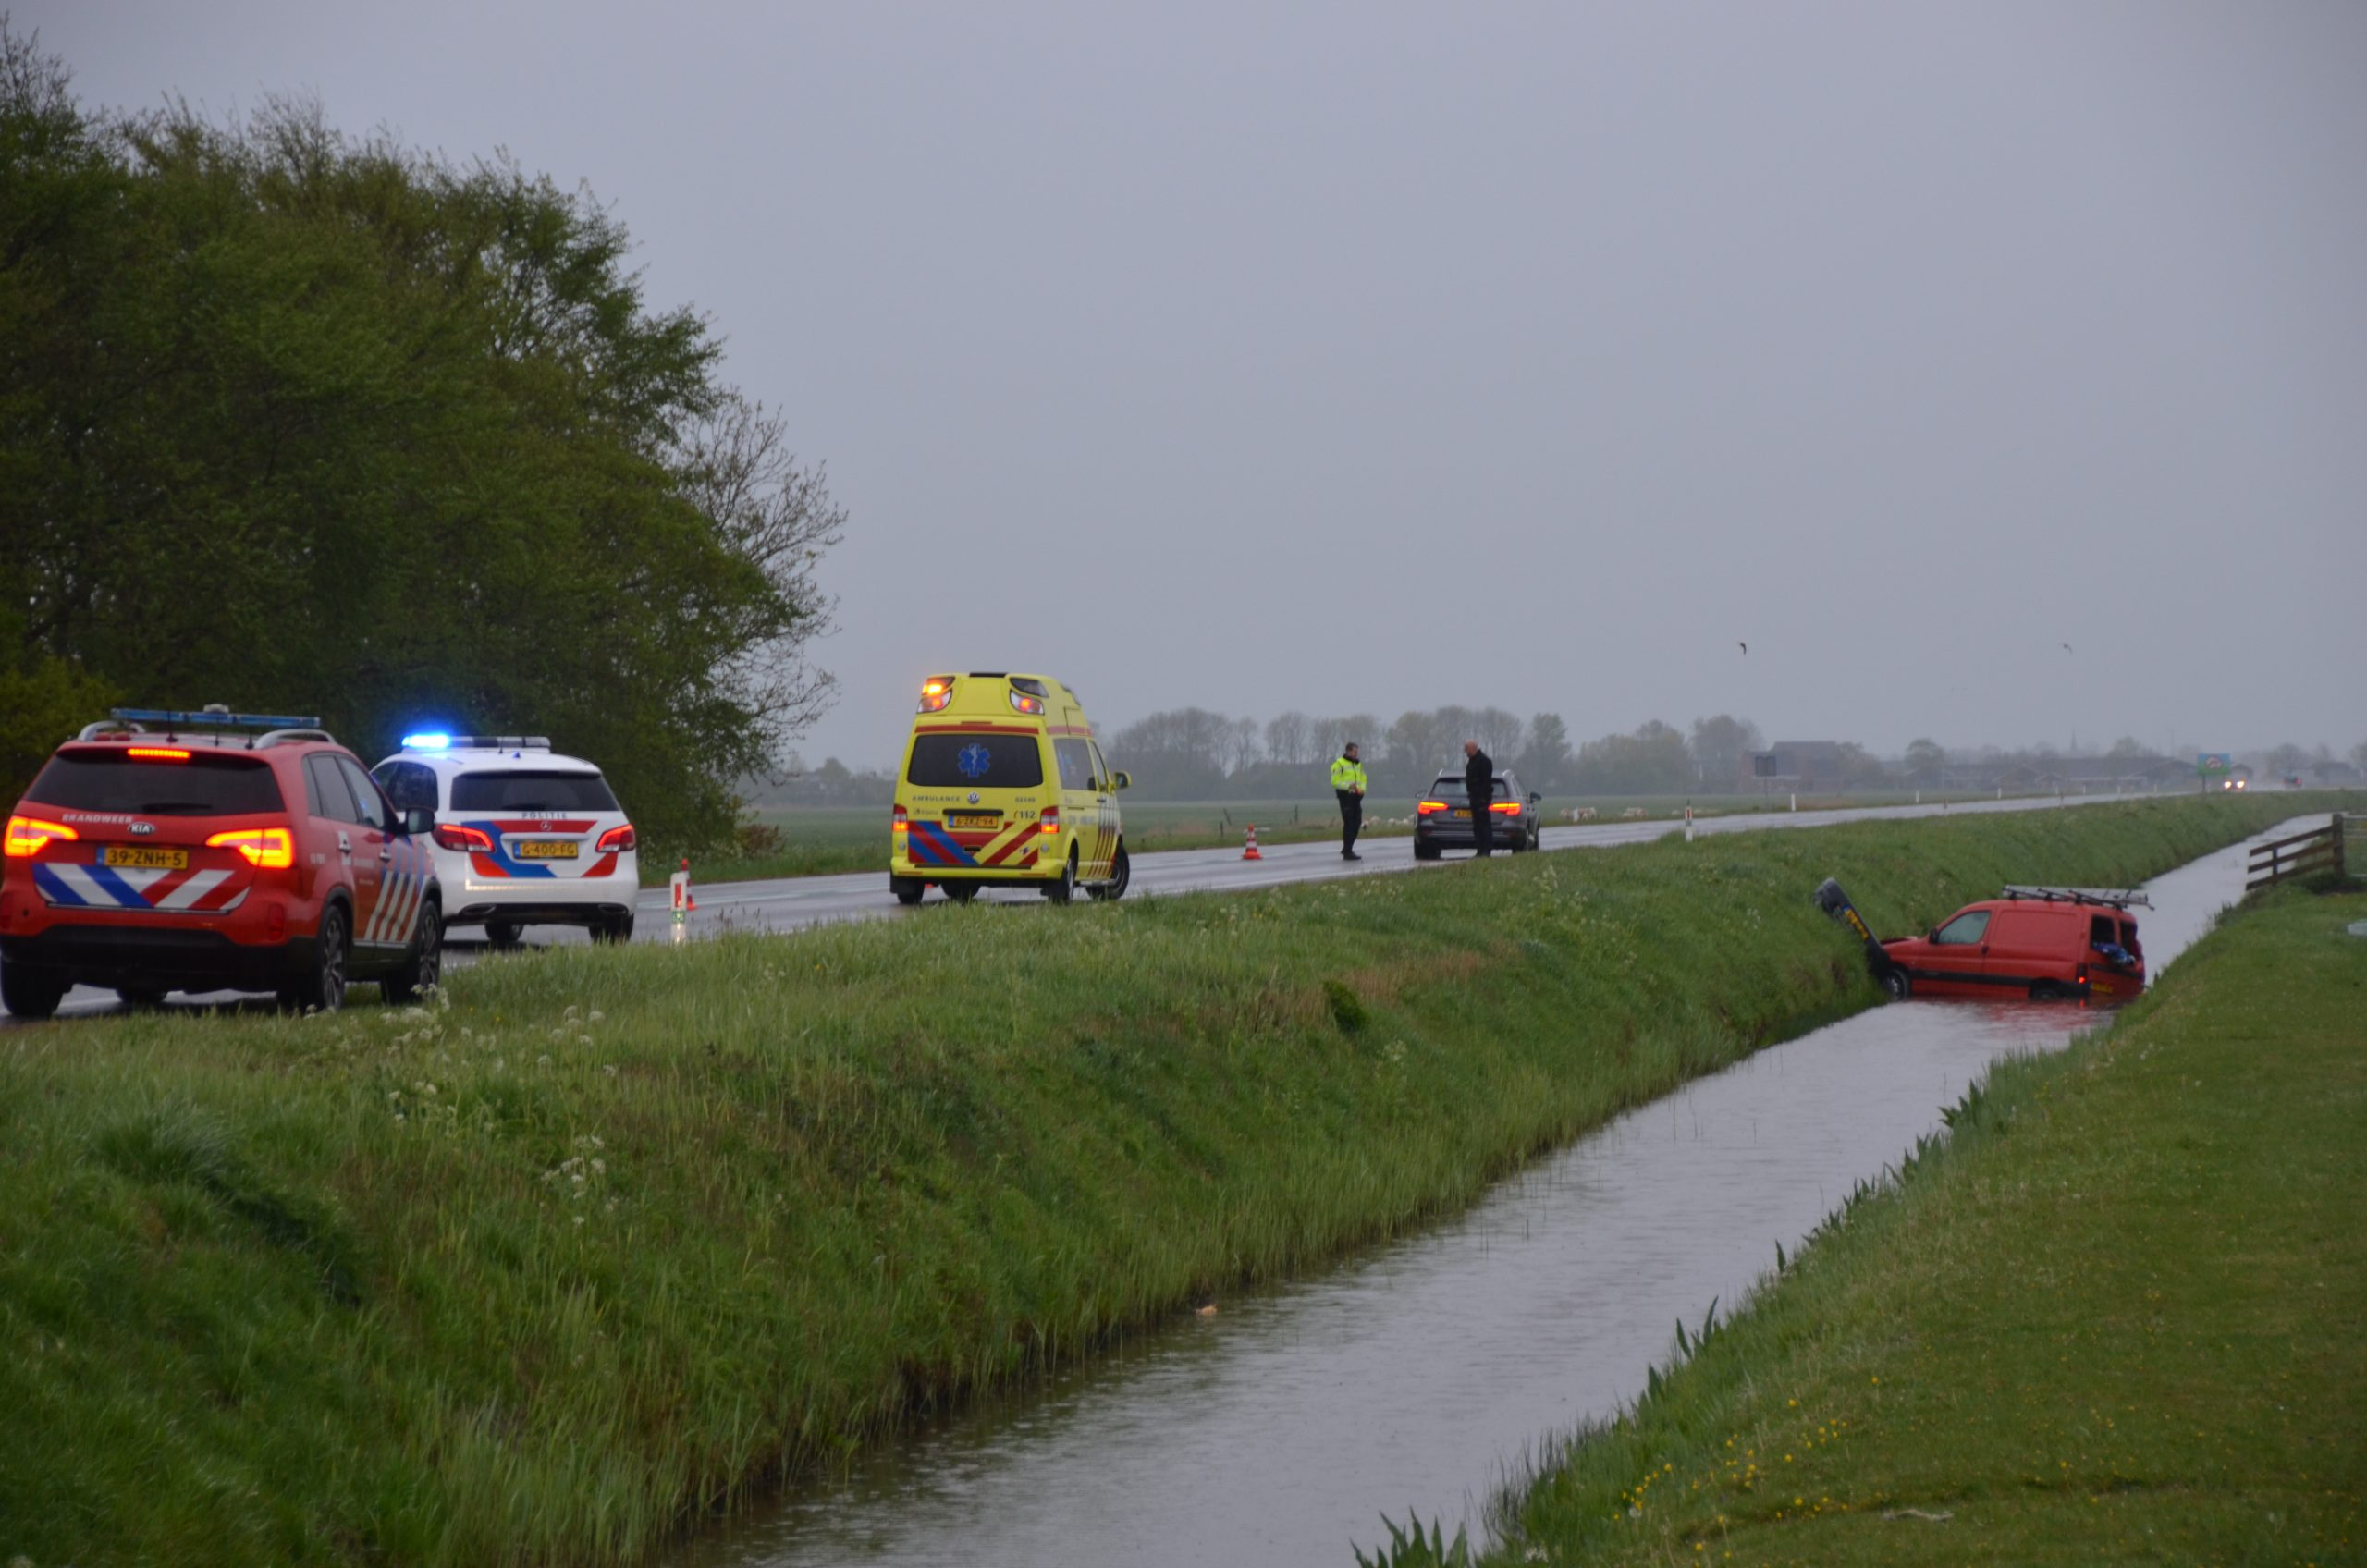 bestelbusje raakte te water bestuurder ongedeerd